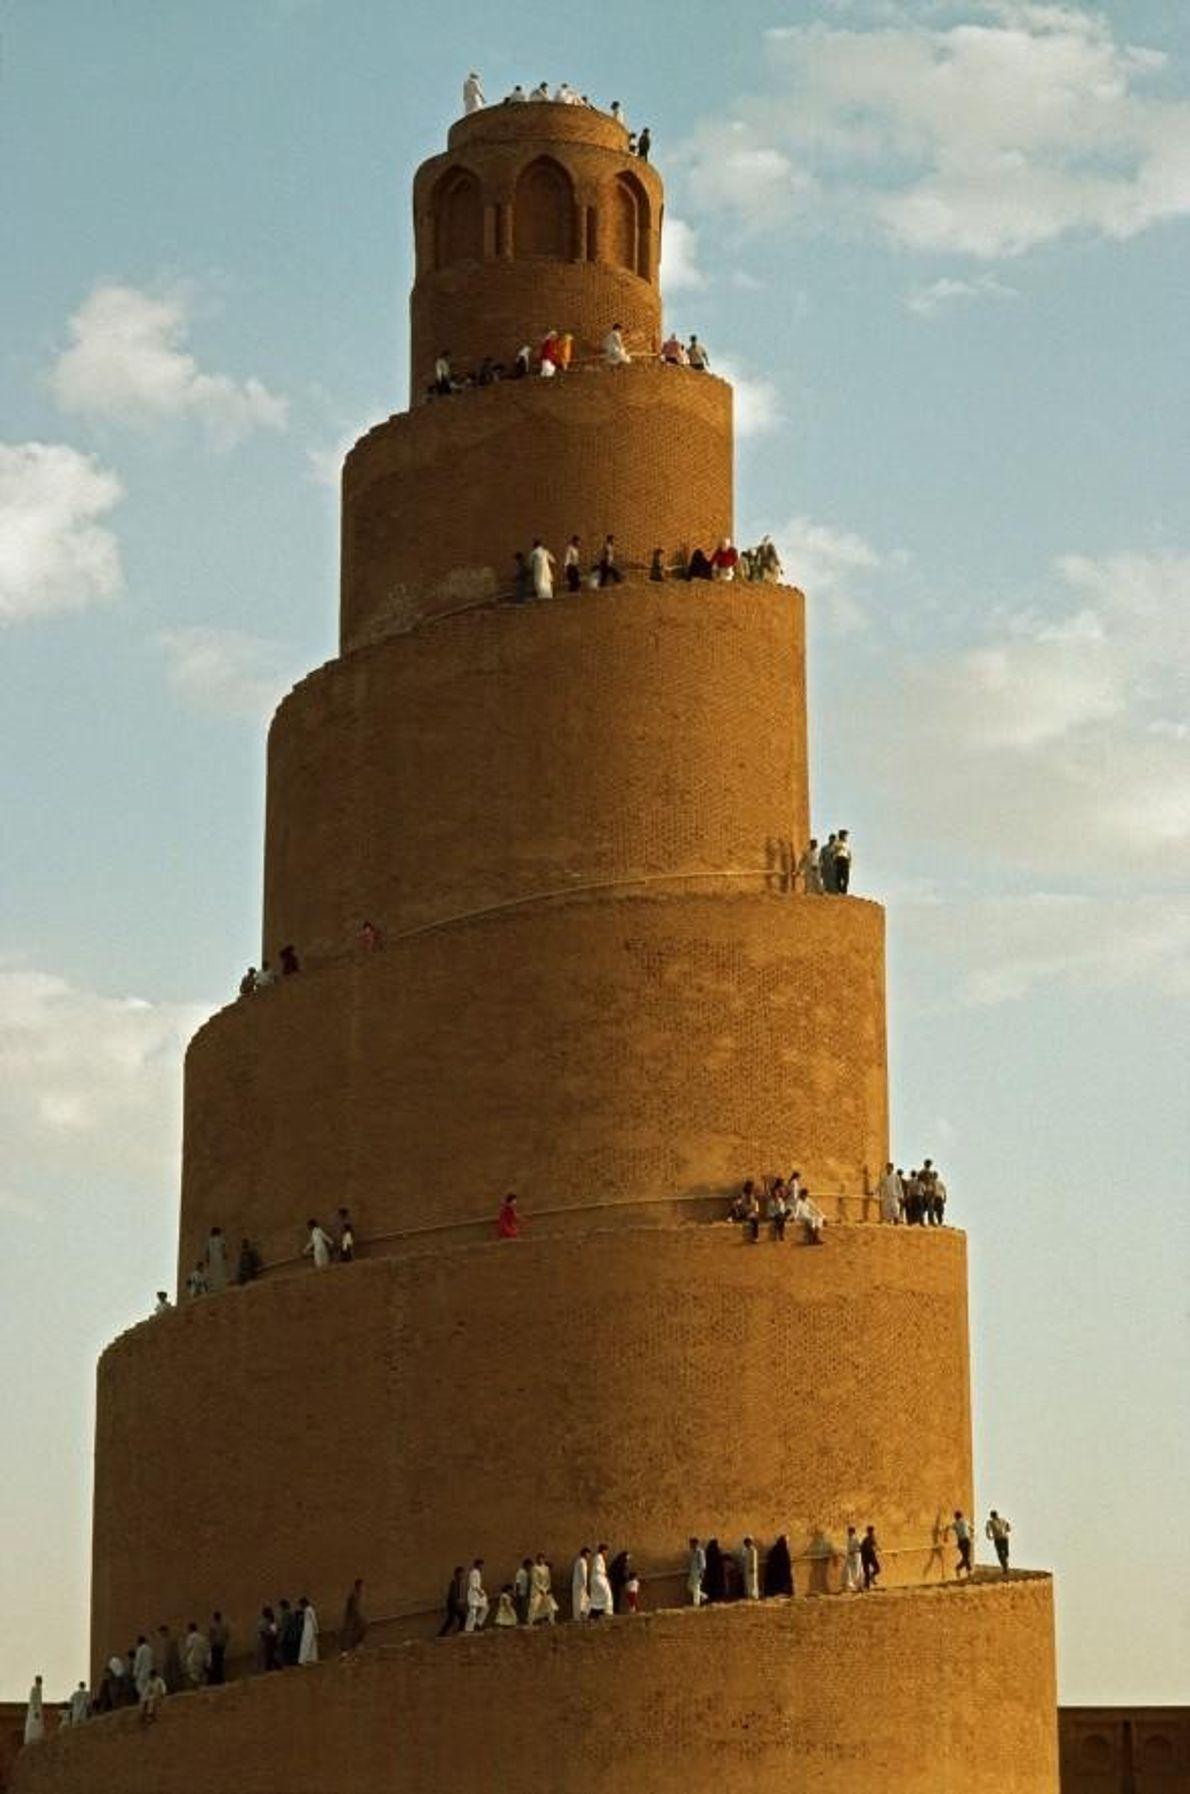 LA VILLE ARCHÉOLOGIQUE DE SAMARRA, IRAK Les mosqués, minarets et palais de Samarra témoignent de l'Empire abbasside, ...